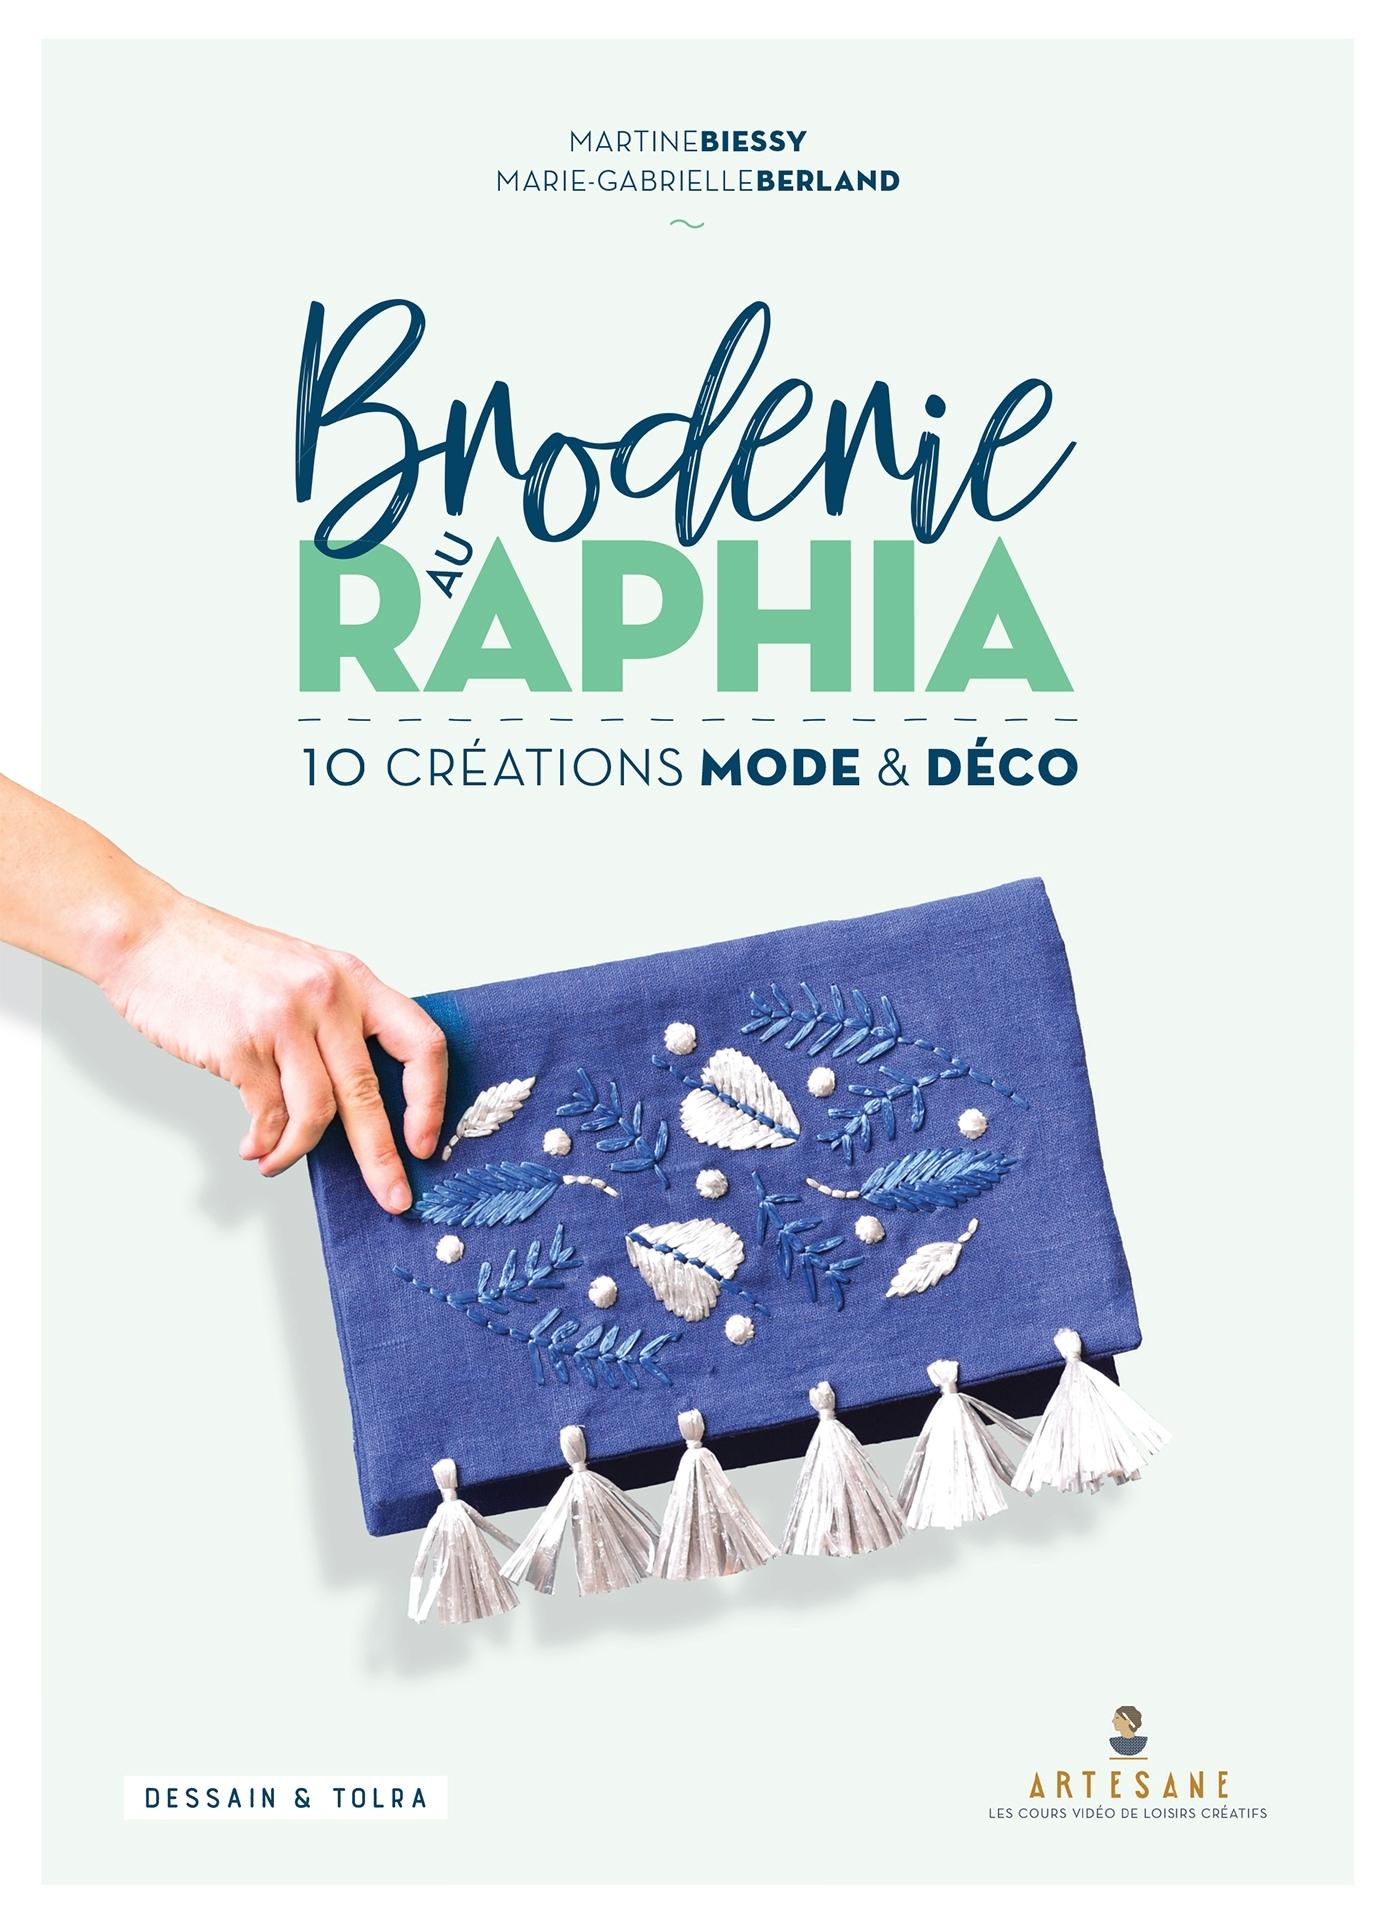 BRODERIE AU RAPHIA - 10 CREATIONS MODE ET DECO